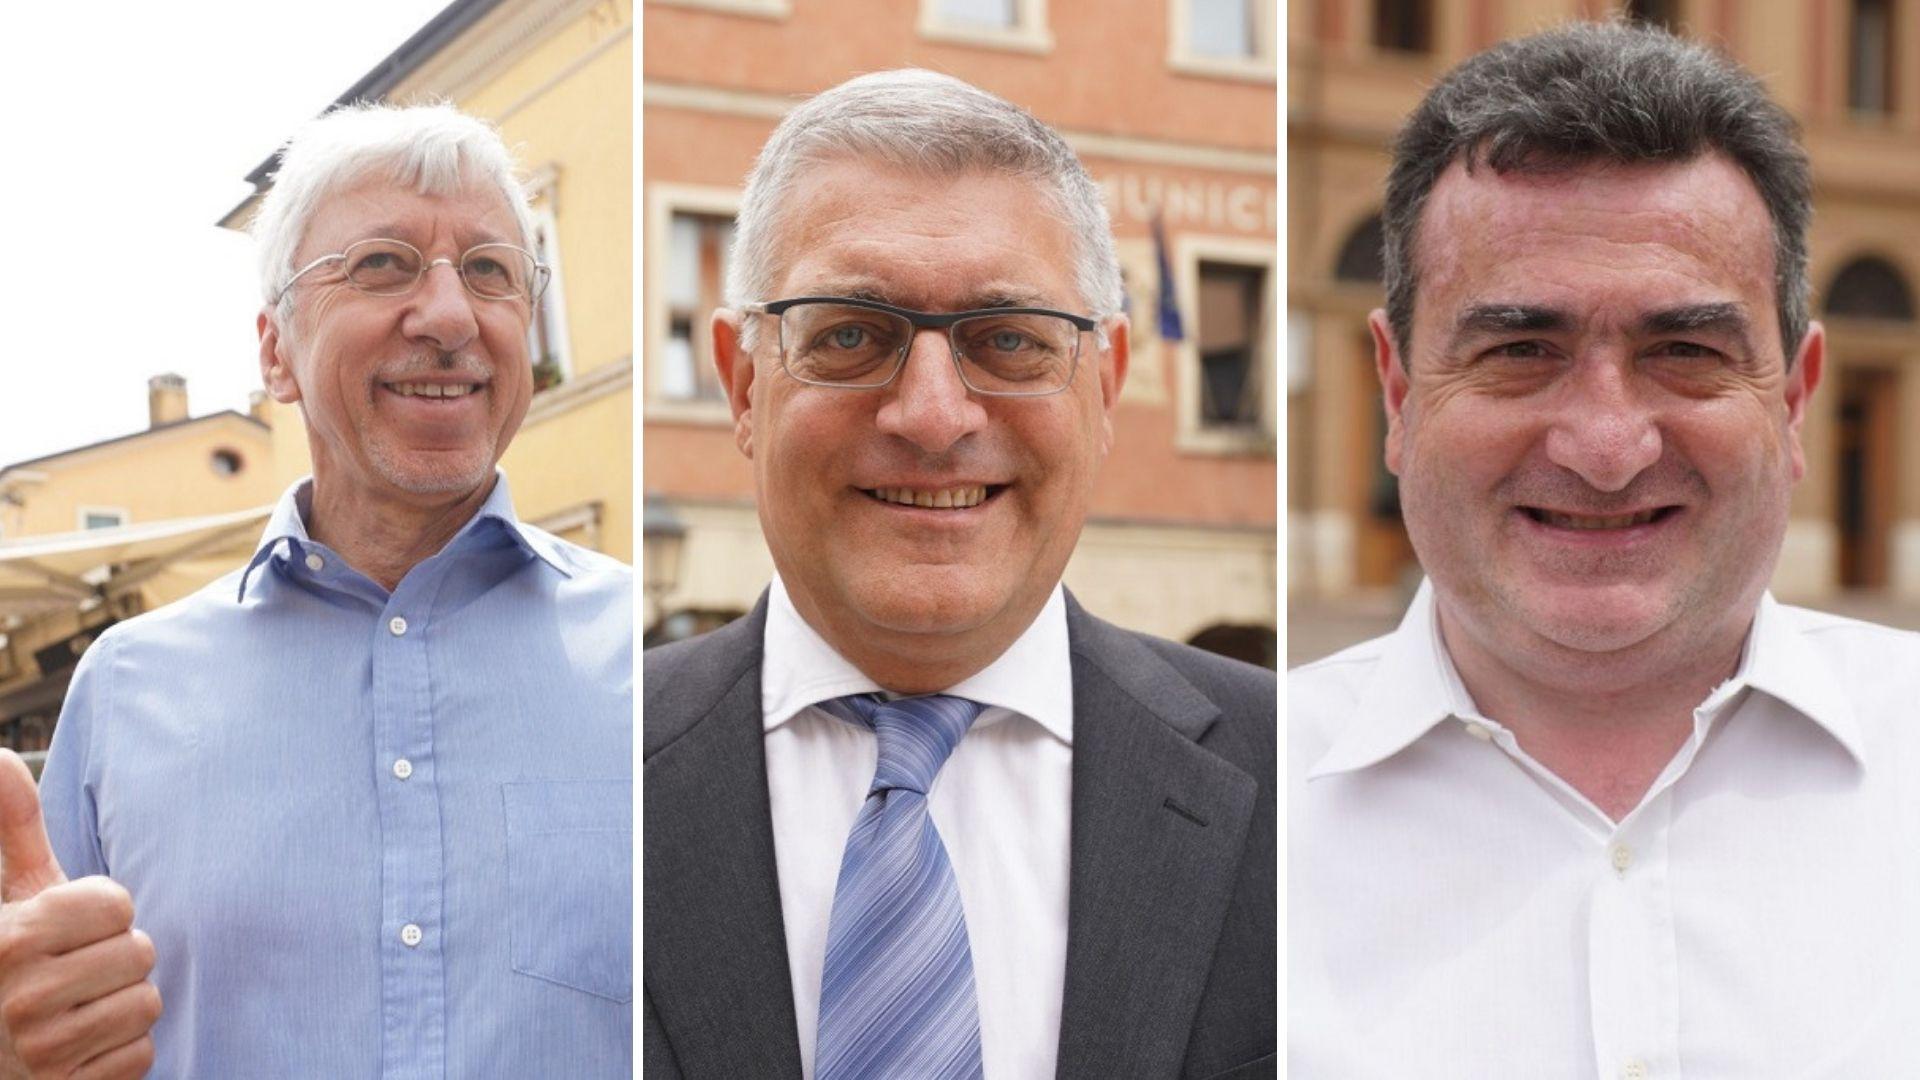 ballottaggio sindaco negrar Grison, pescantina Quarella, san bonifacio provoli